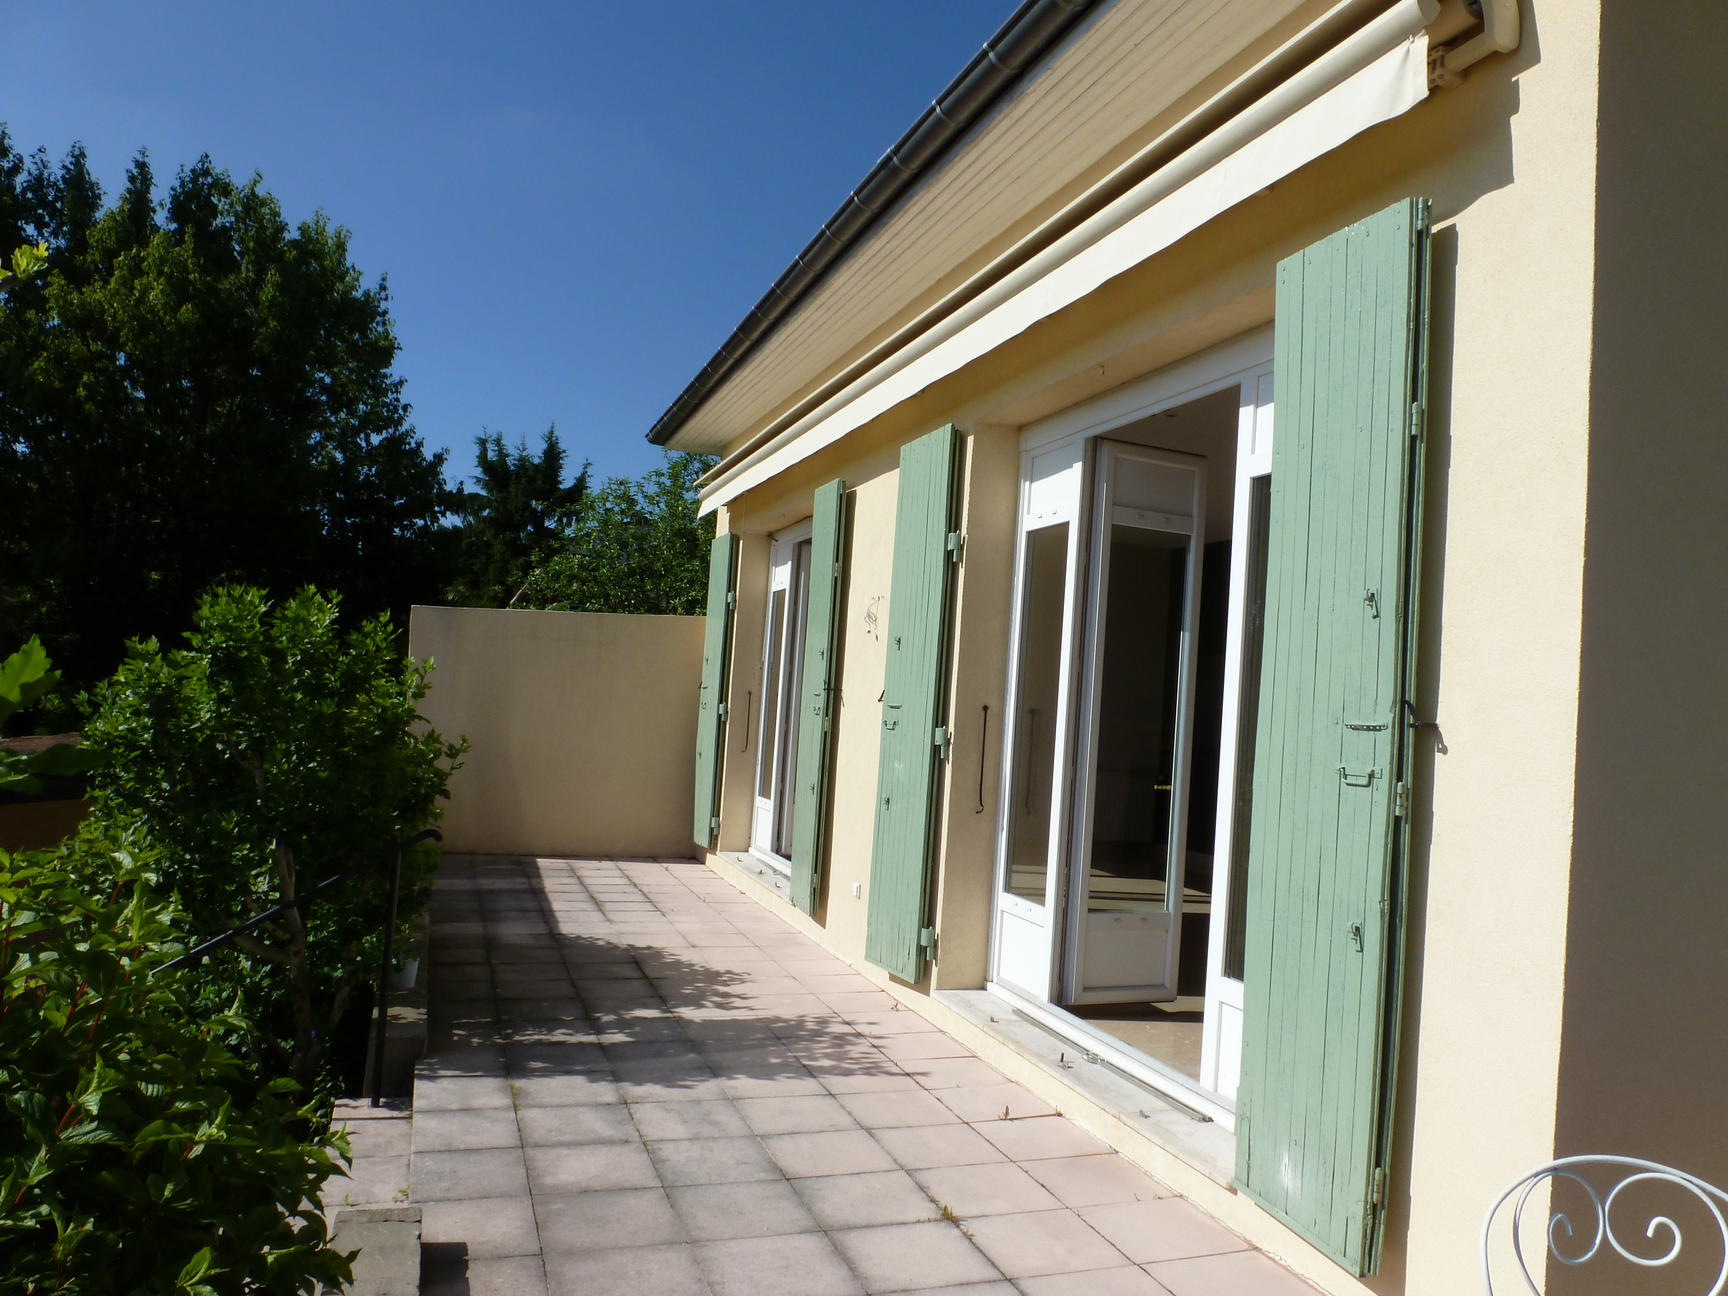 Frederique Guillerme Agence Immobiliere Maison 160m2 Renovee